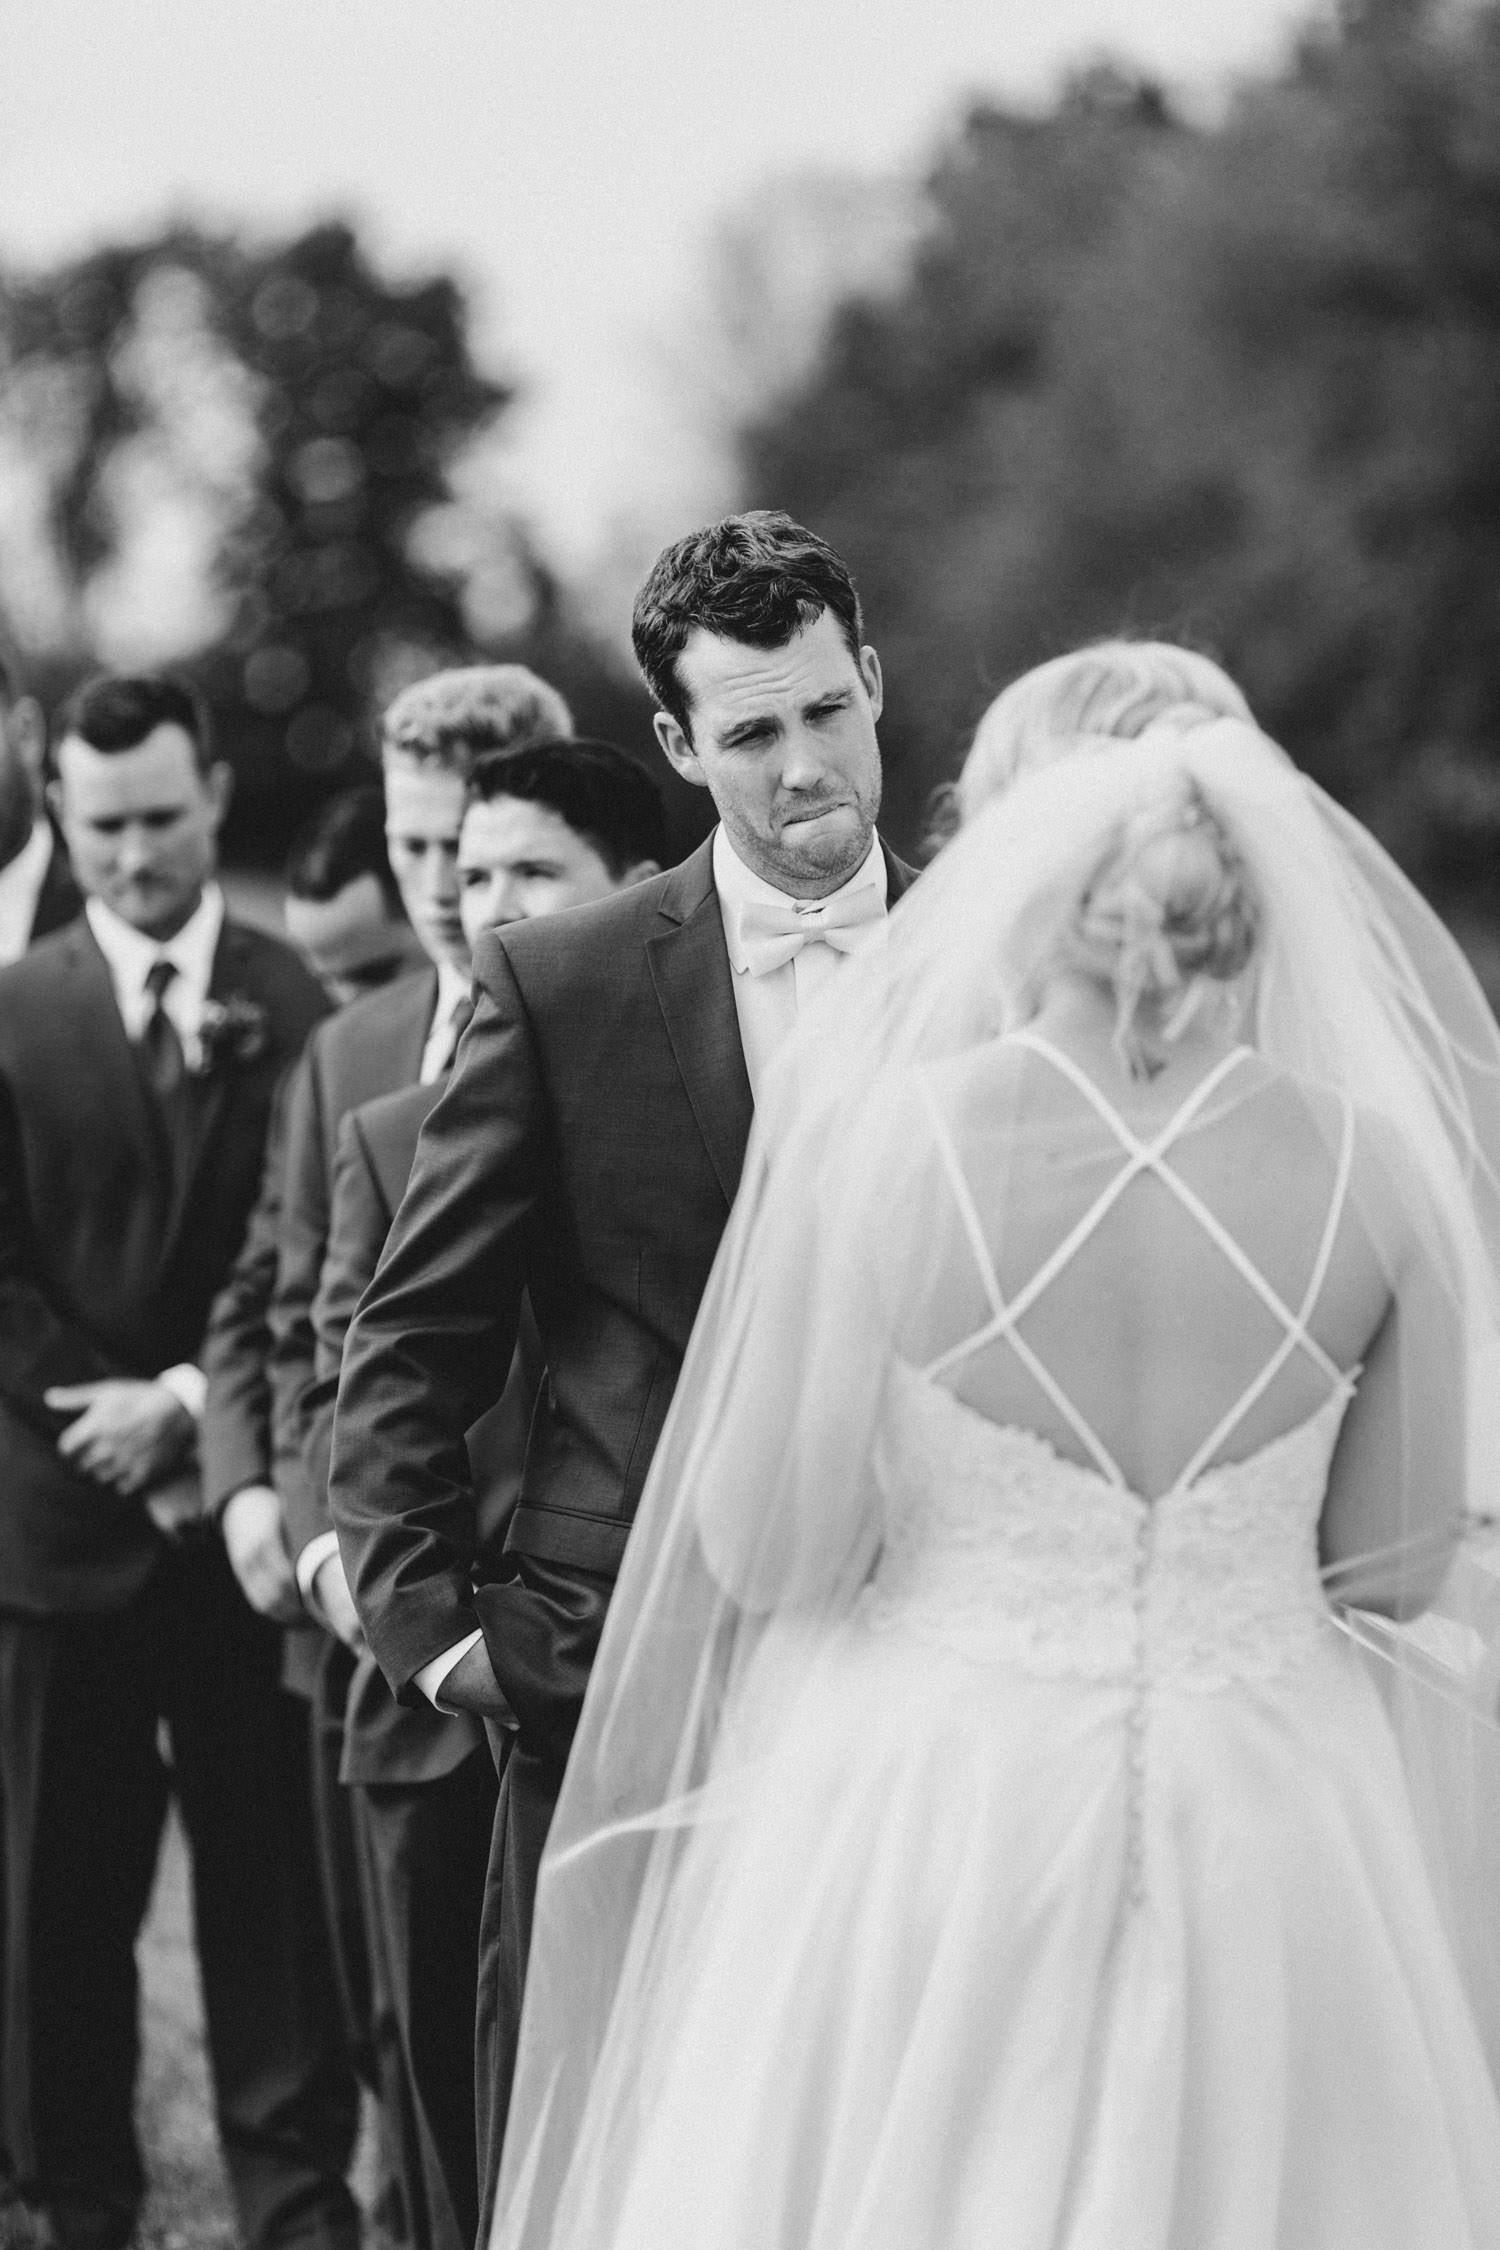 groom cries during wedding vows - ottawa wedding photographer - carley teresa photography